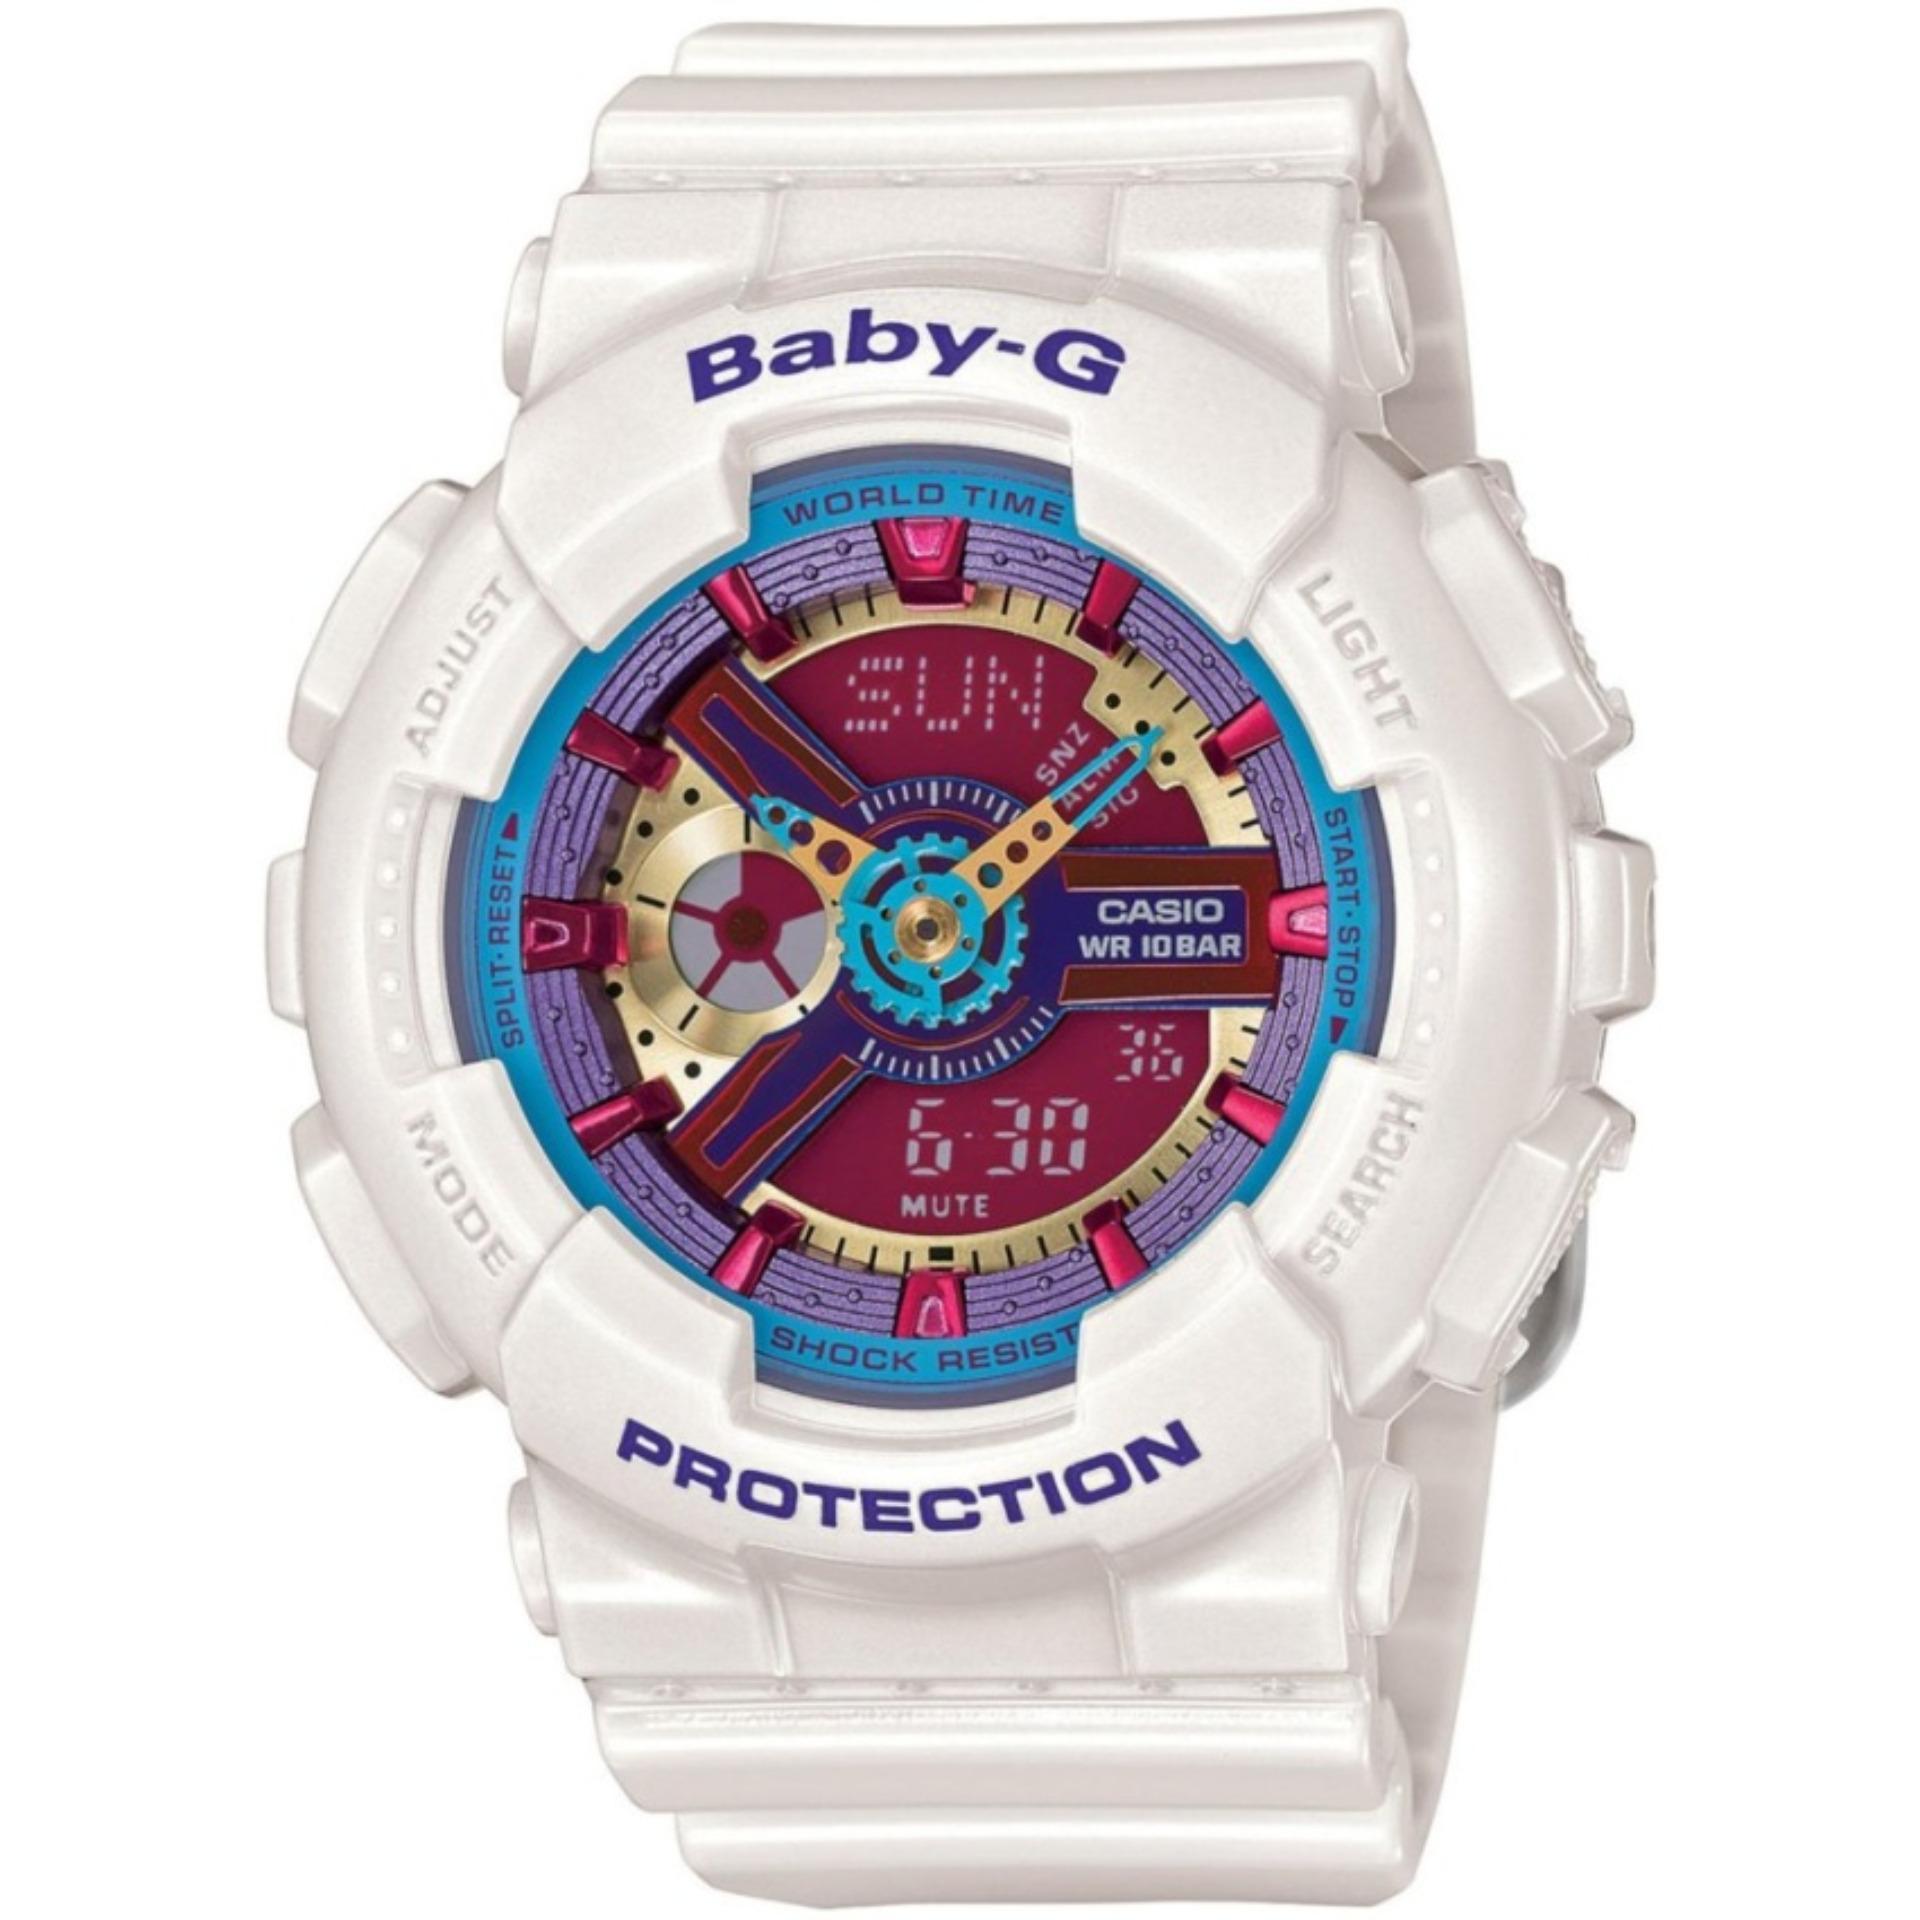 Casio Jam Tangan Pria Biru Strap Resin Mq 71 2b Spec Dan Daftar Europe 27 7bu Black Rubber Baby G Womens Blue Watch Ba 112